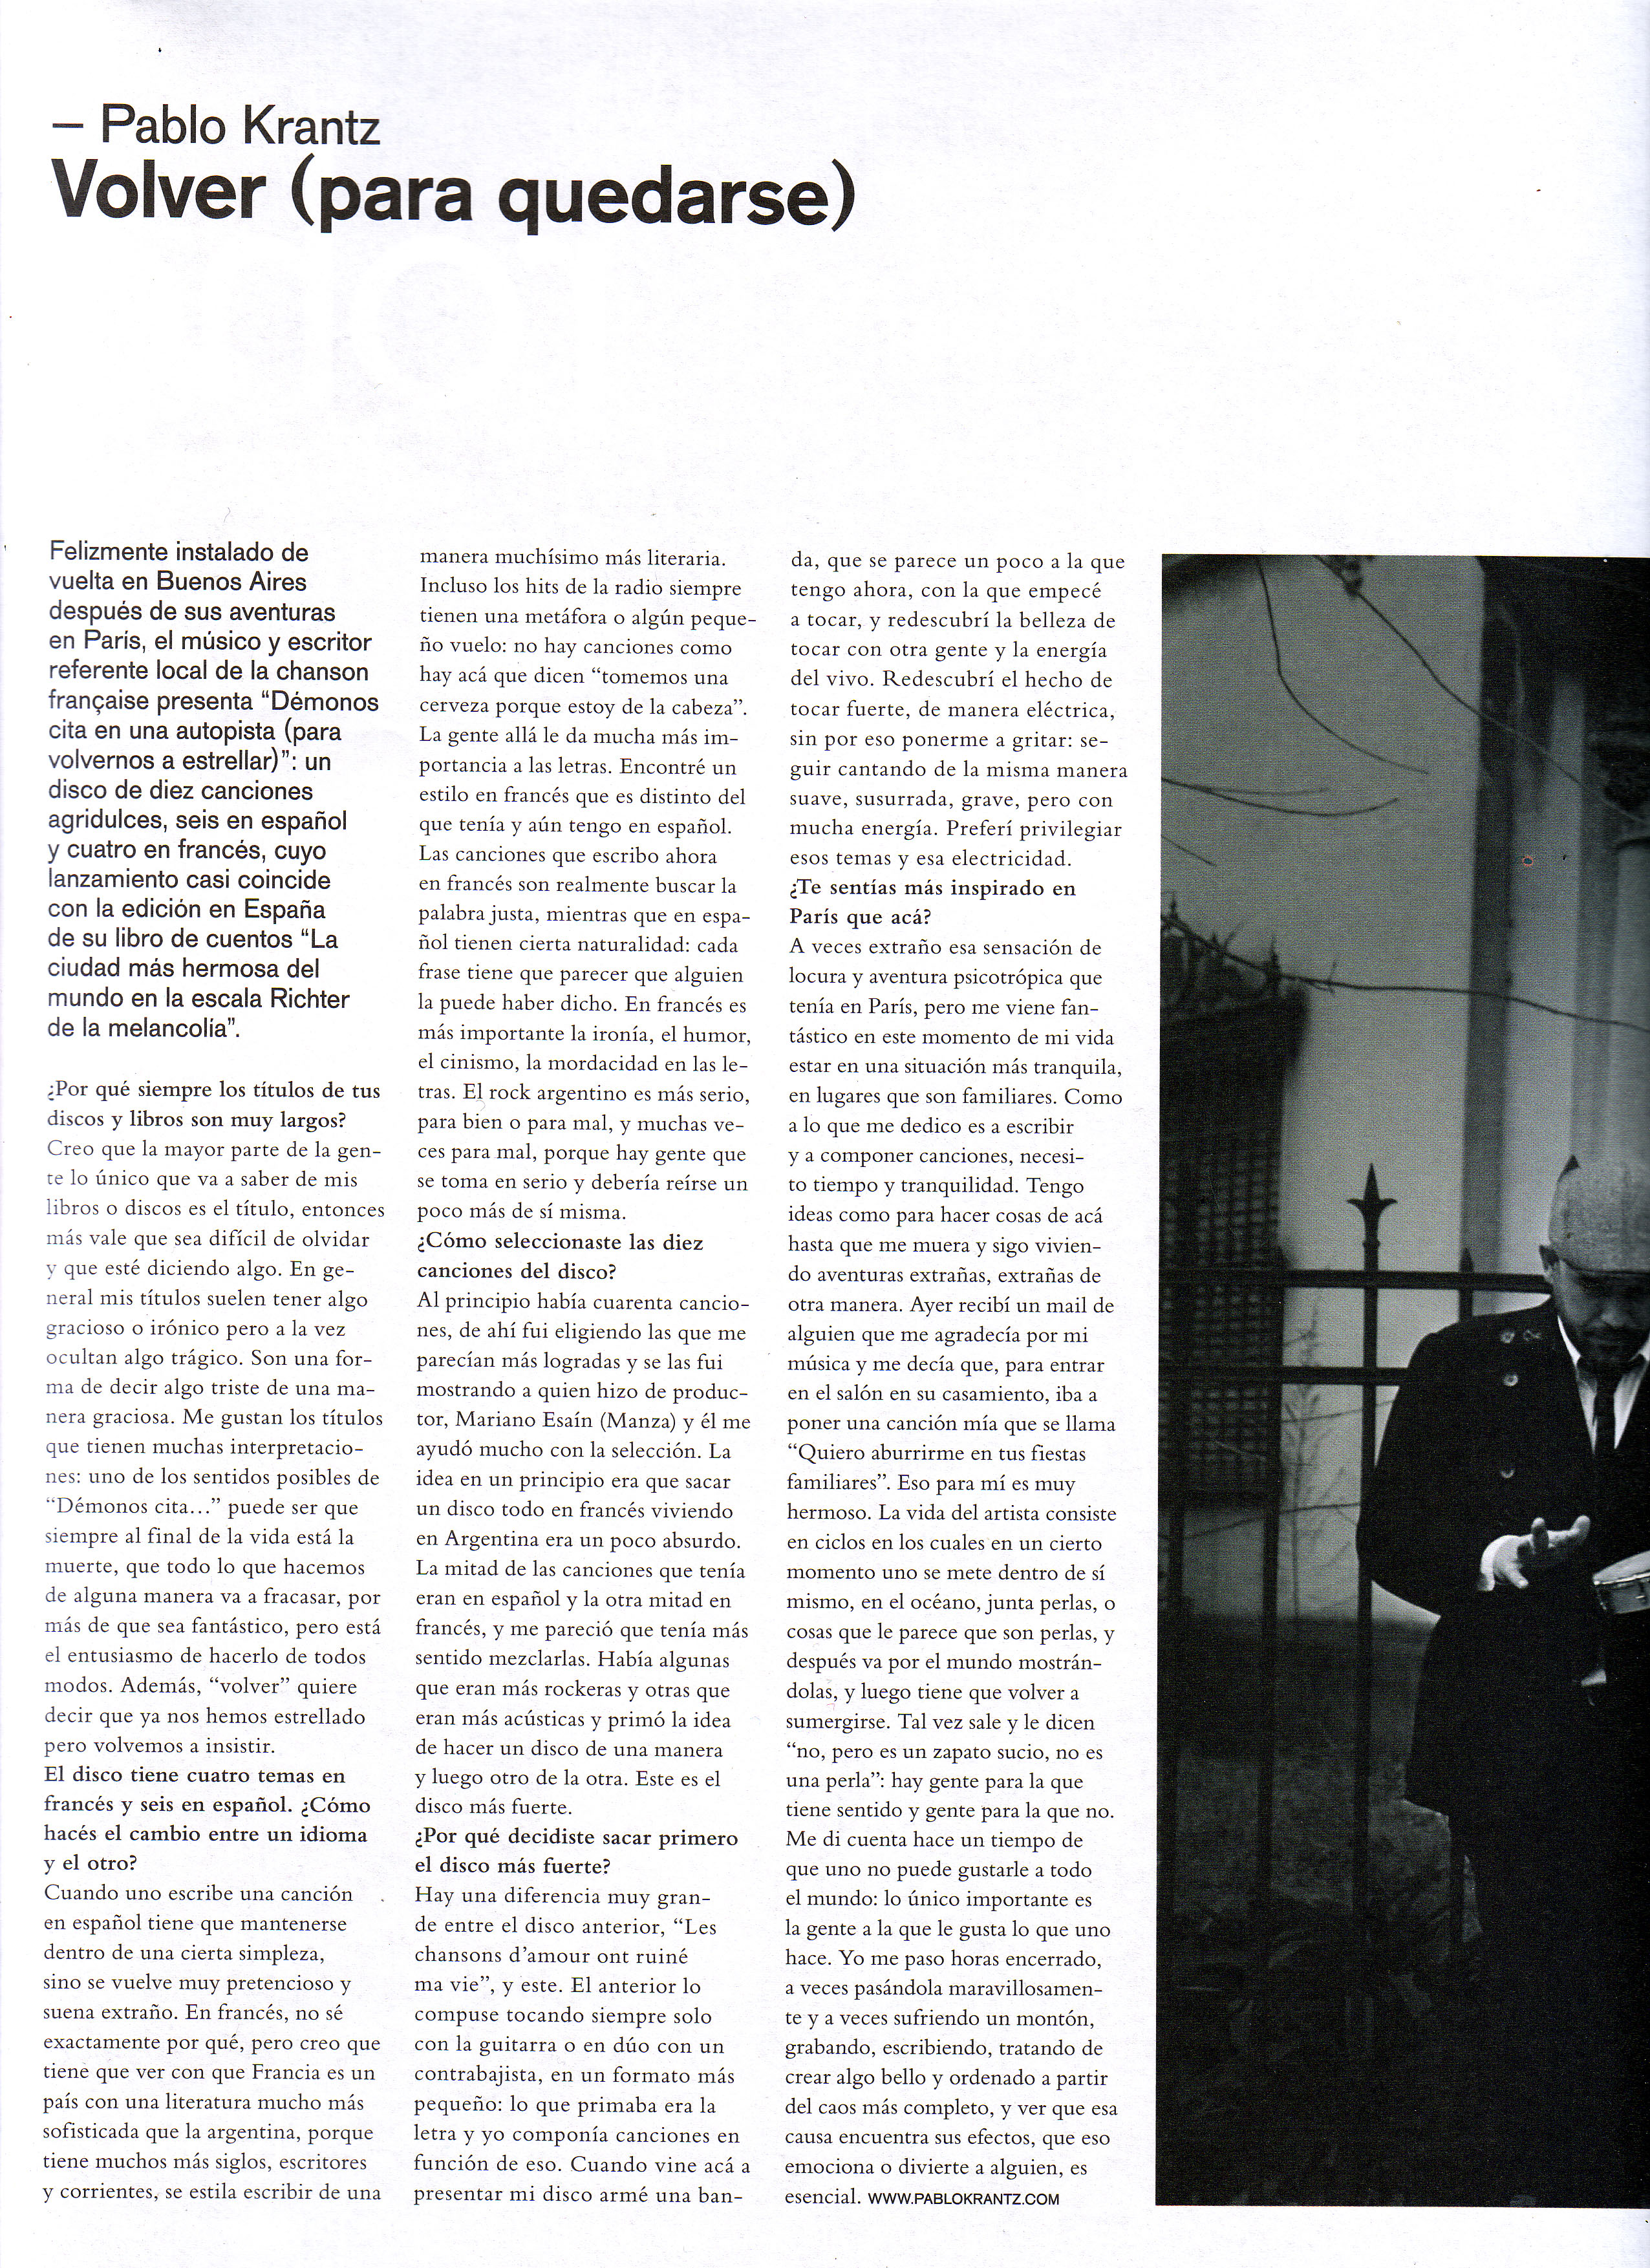 Revista Dmag. Argentina, 2011 parte 1